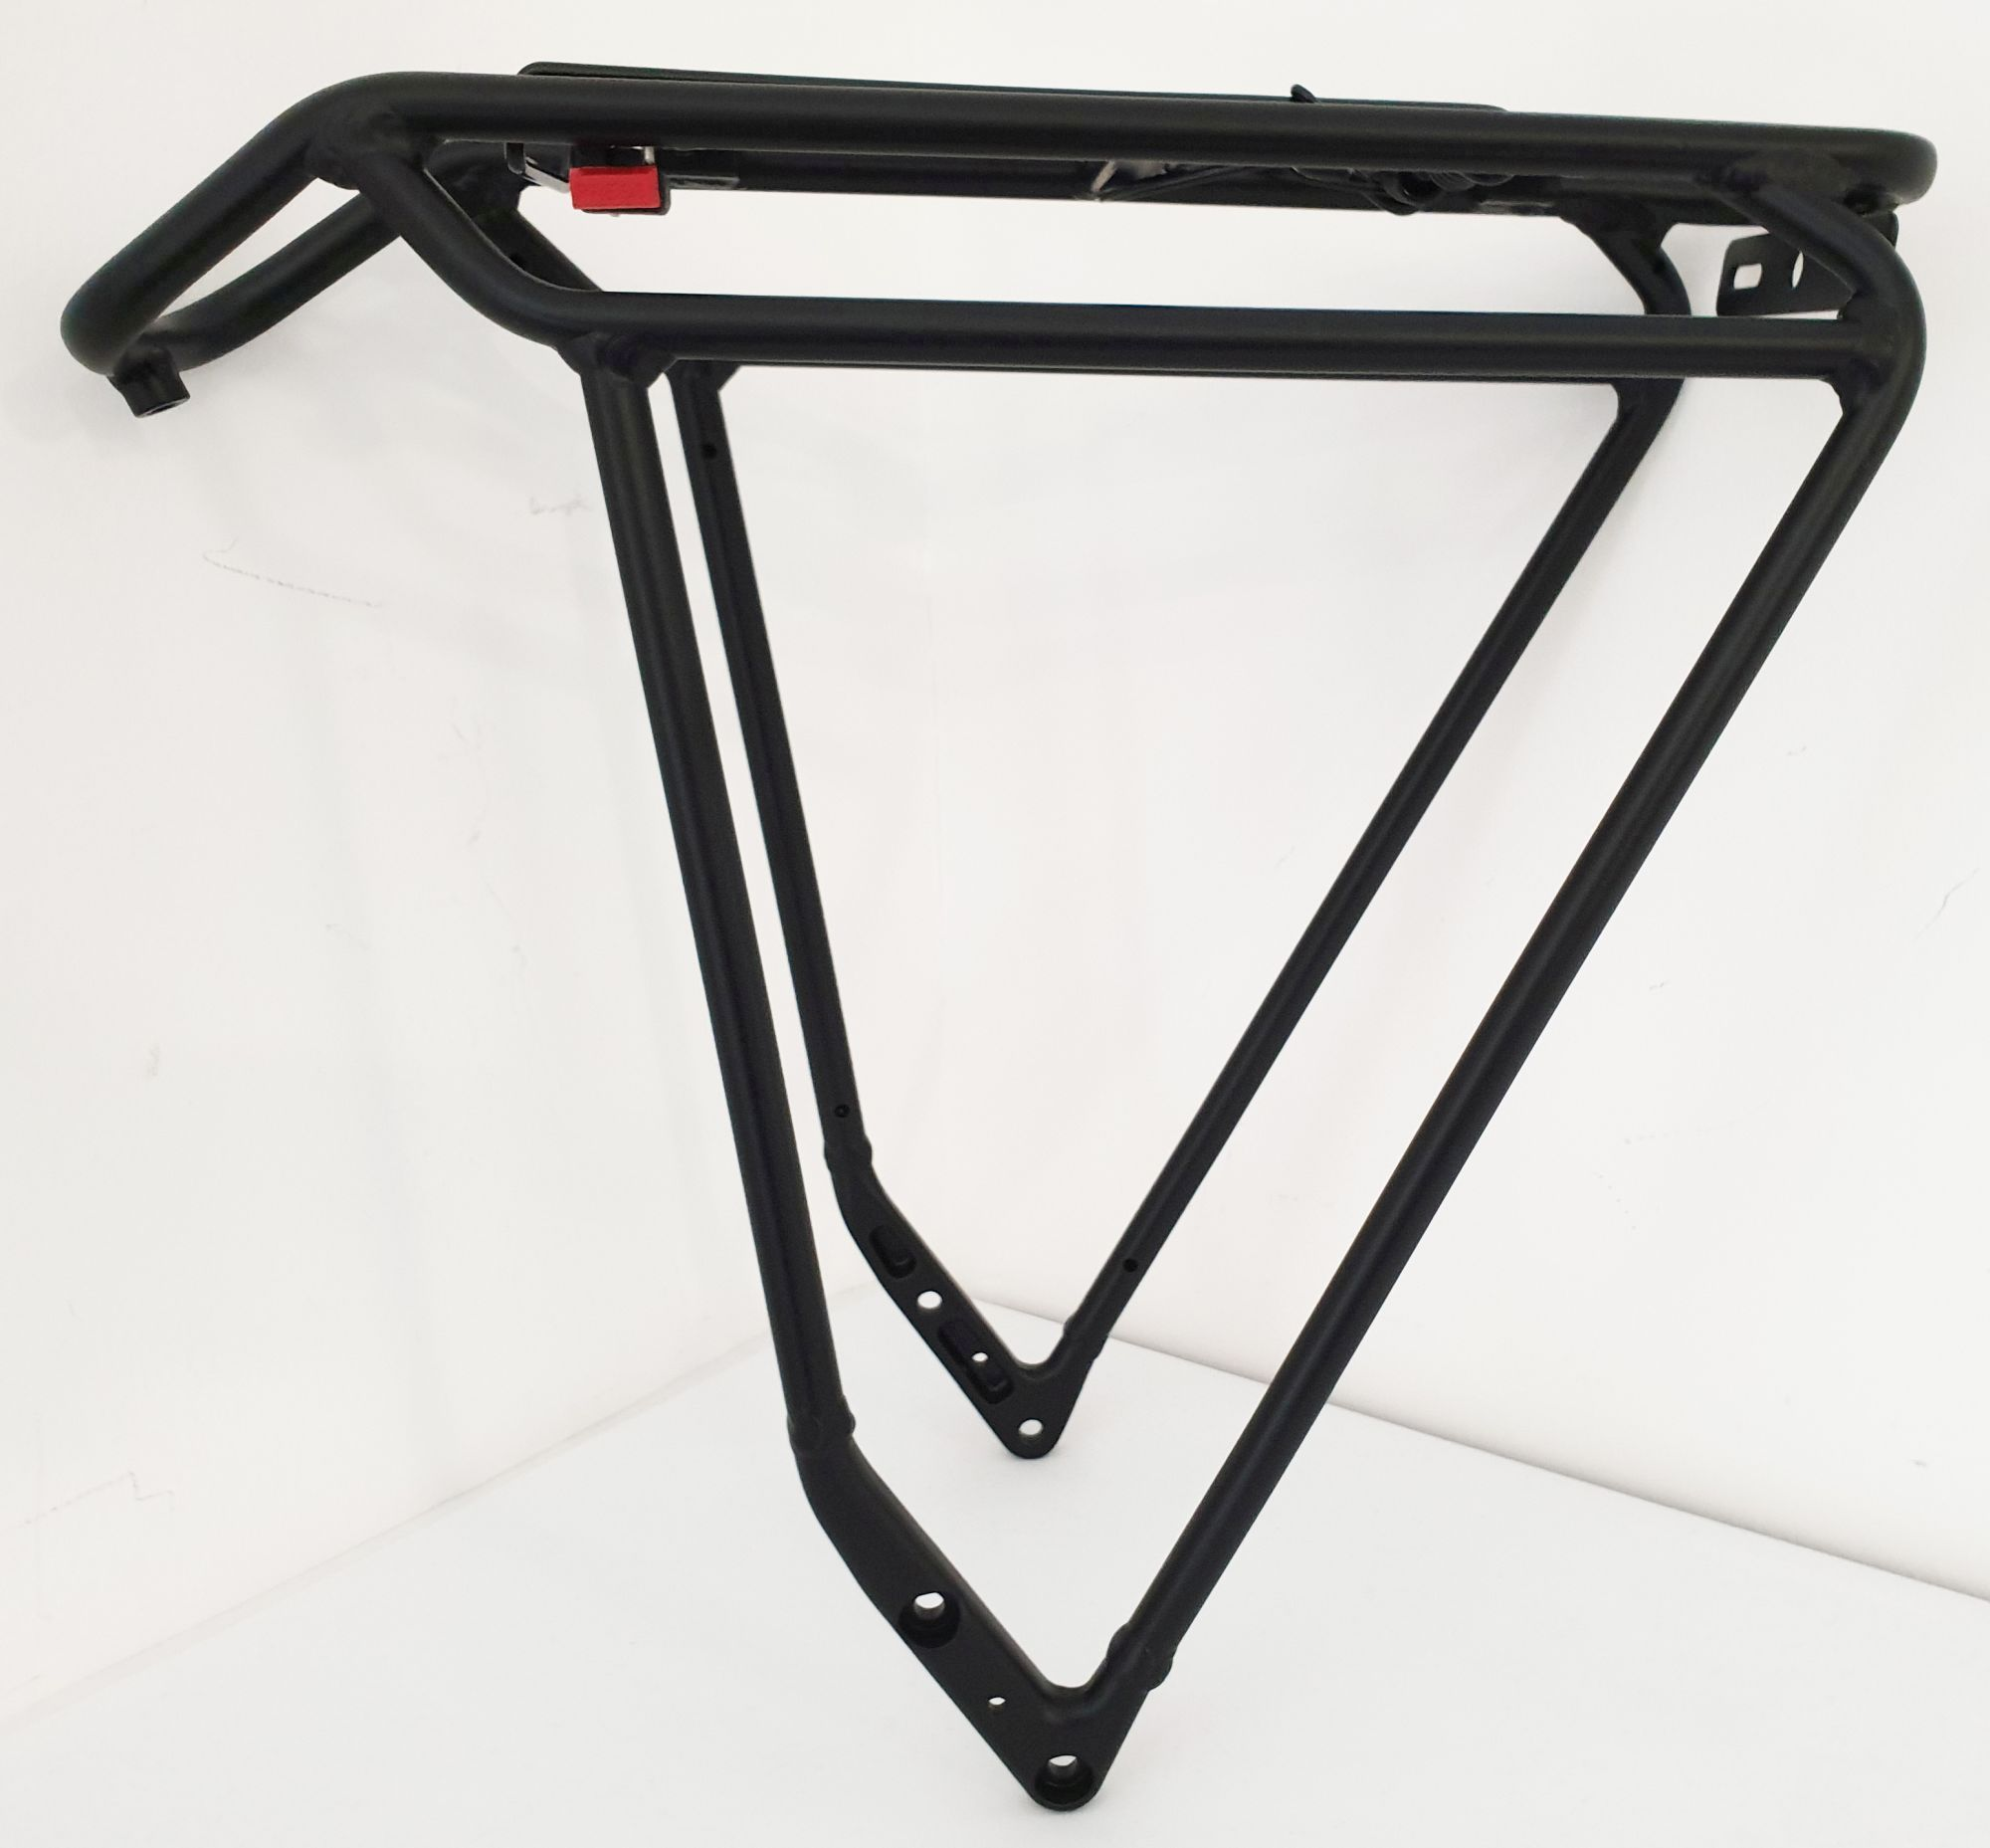 Fahrradteile/Gepäckträger: Standwell  Gepäckträger SW-KM079SB